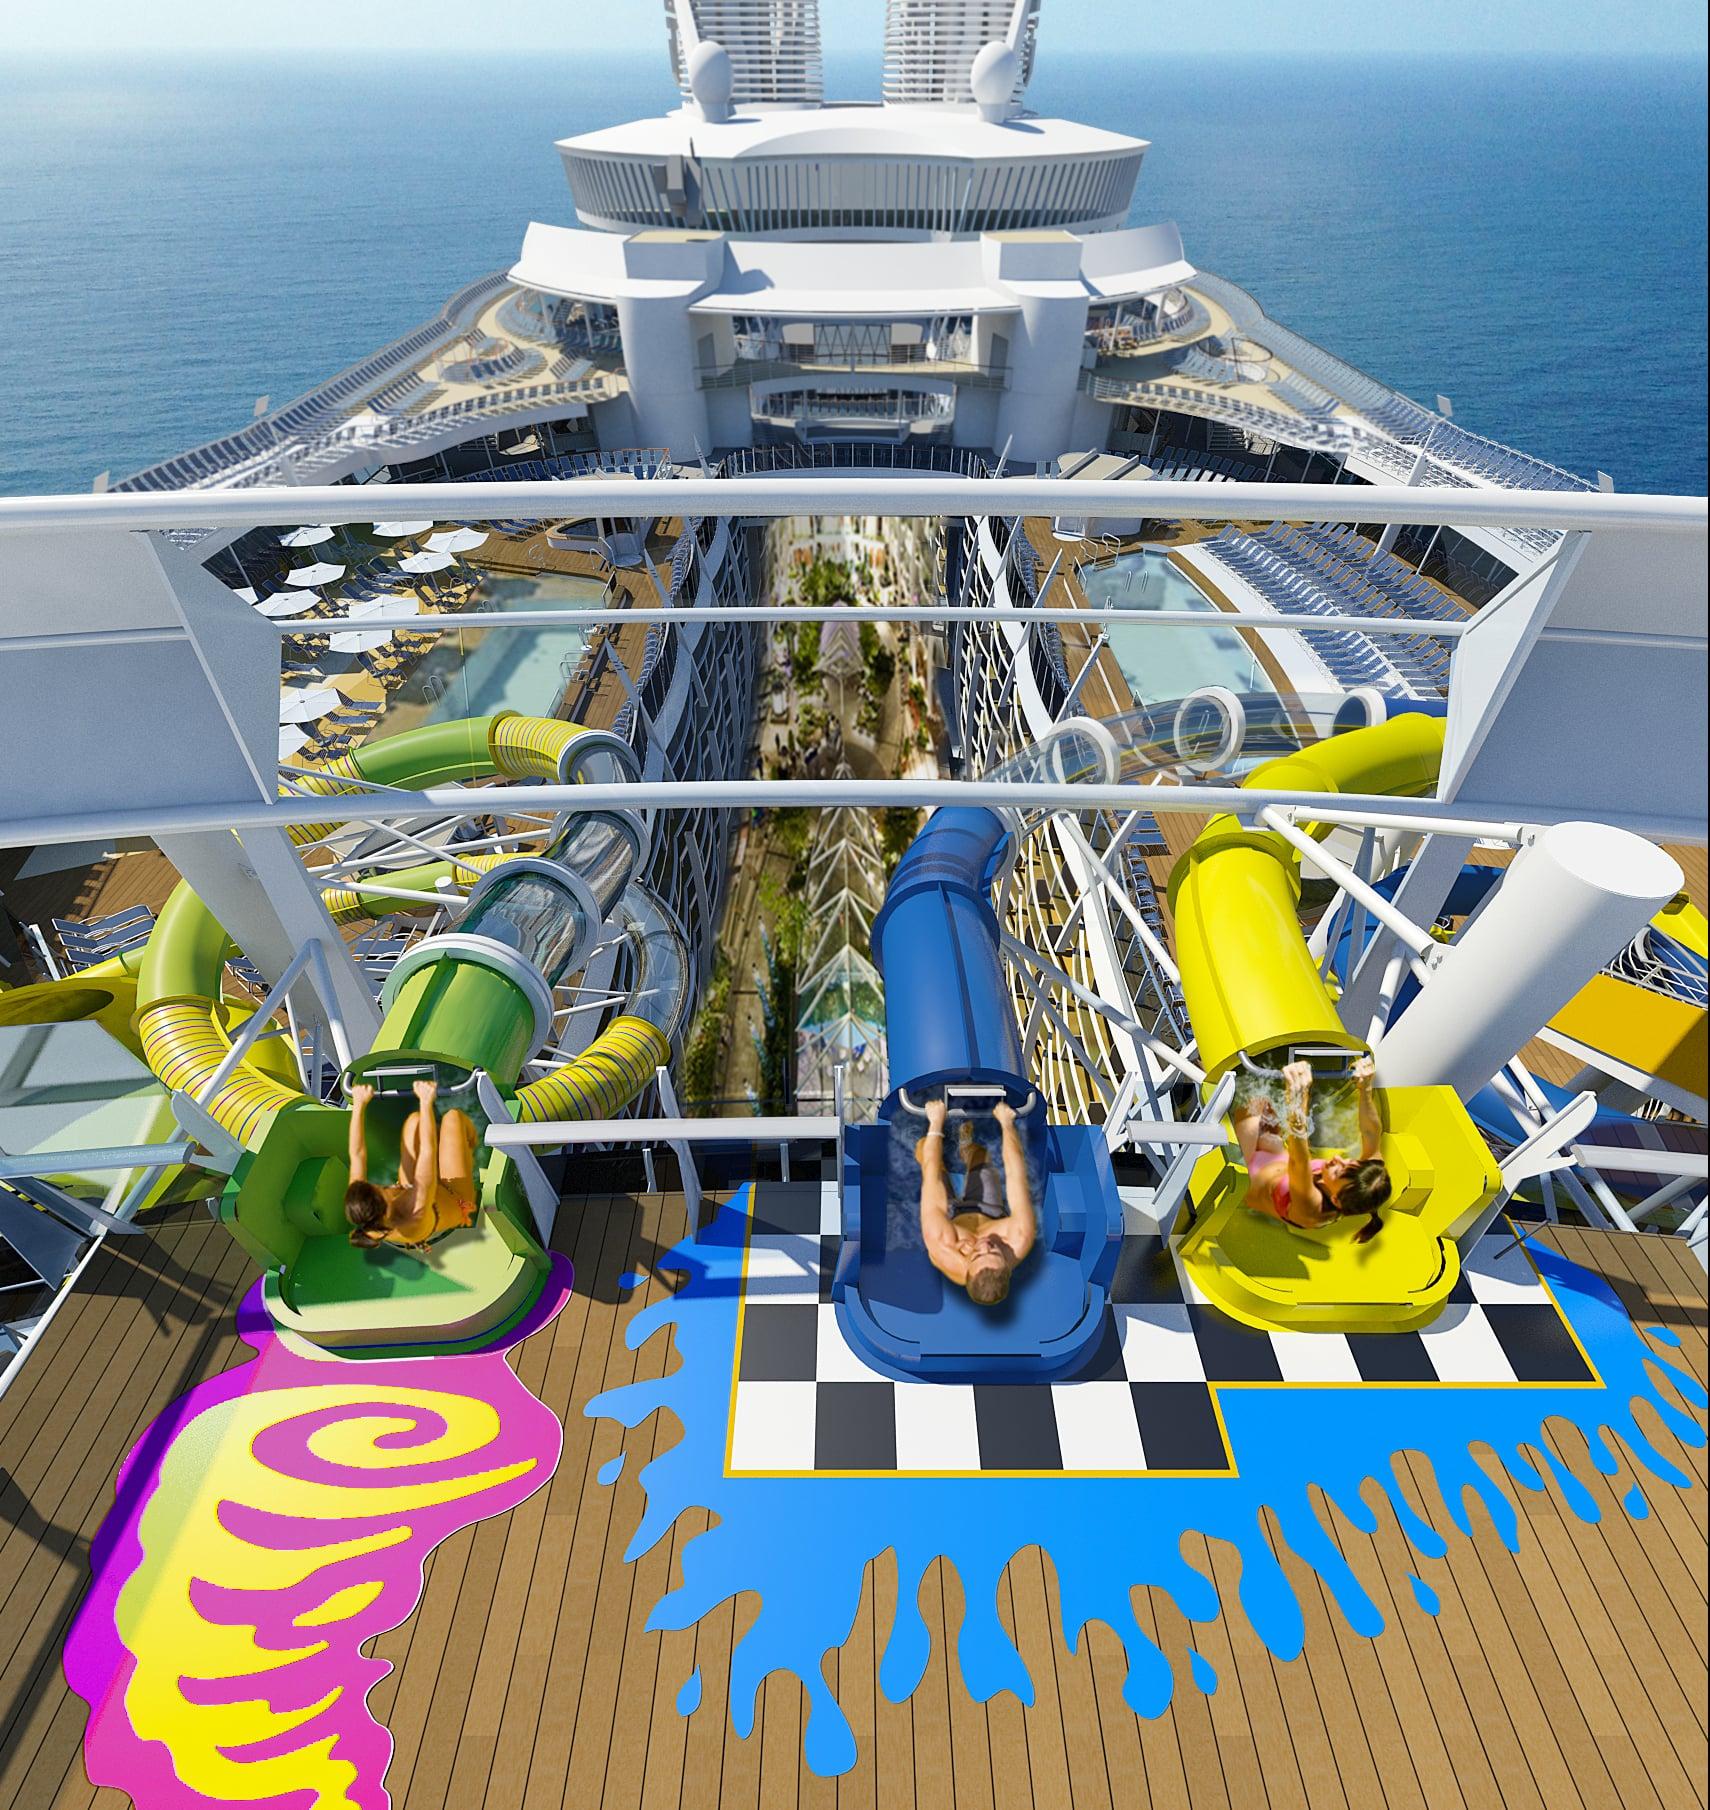 Royal Caribbean Inside The Worlds Largest Cruise Ship